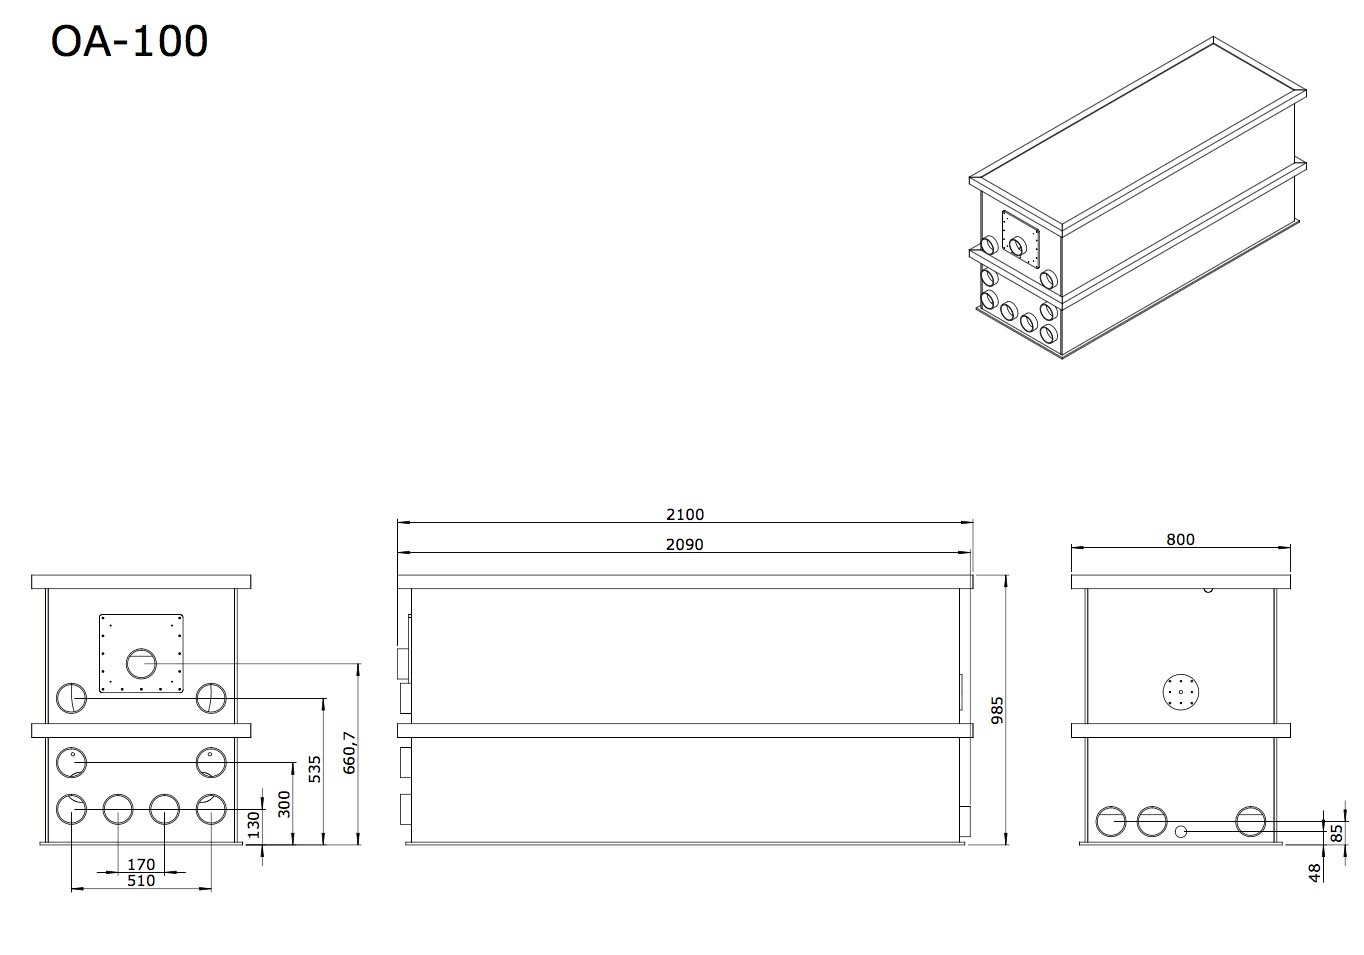 vijver-aem-oa-100-combi-totaalfilter-detail-tekening